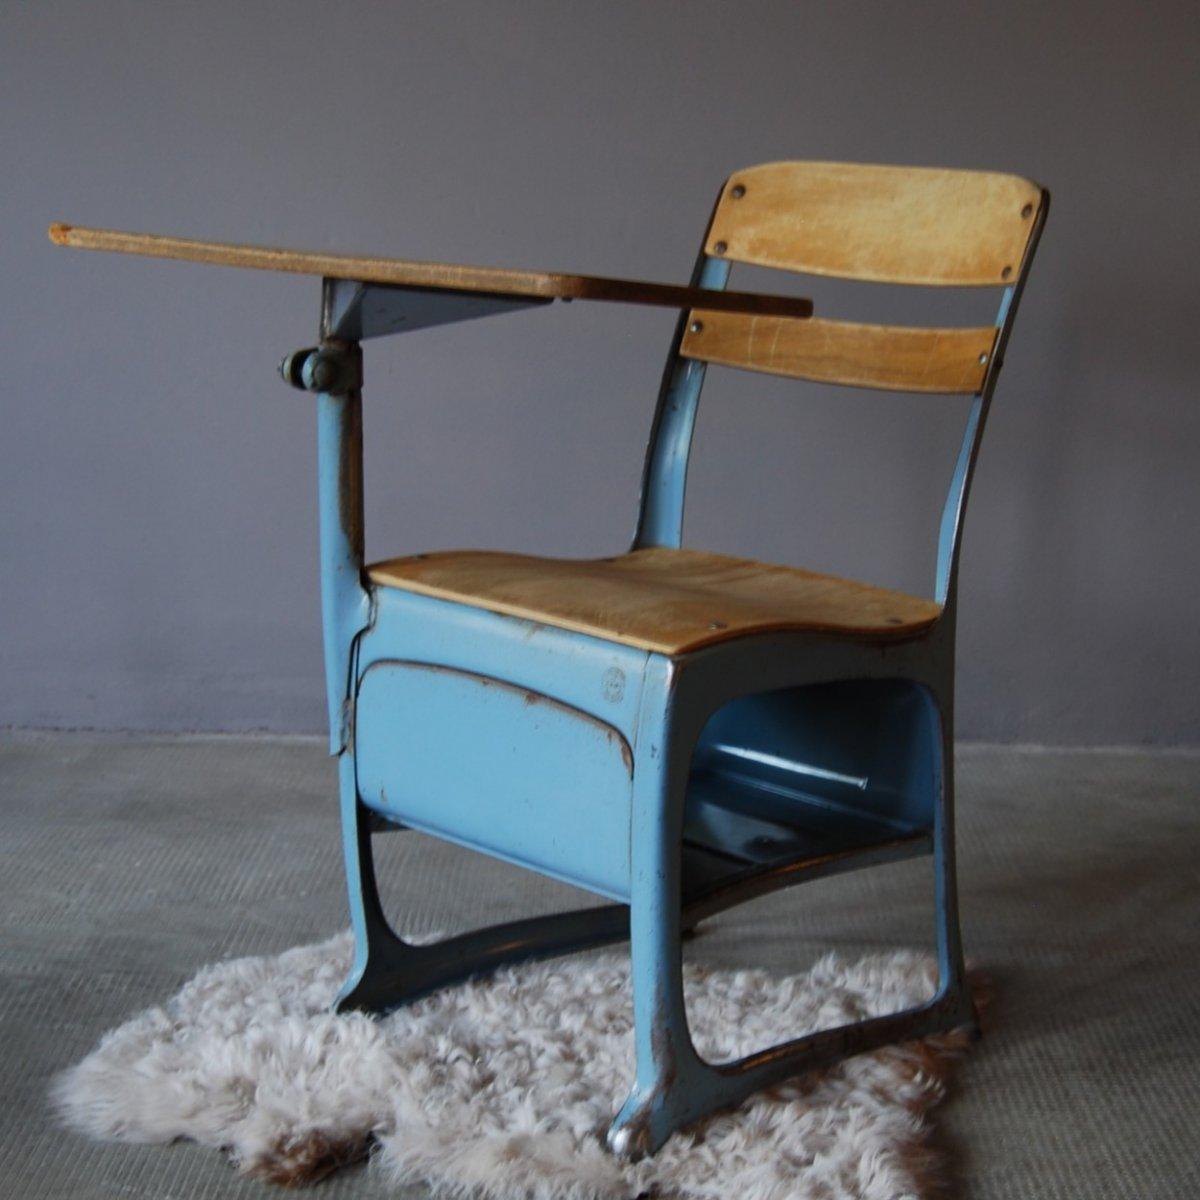 Muebles vintage para habitaciones infantiles decoraci n for Muebles vintage com